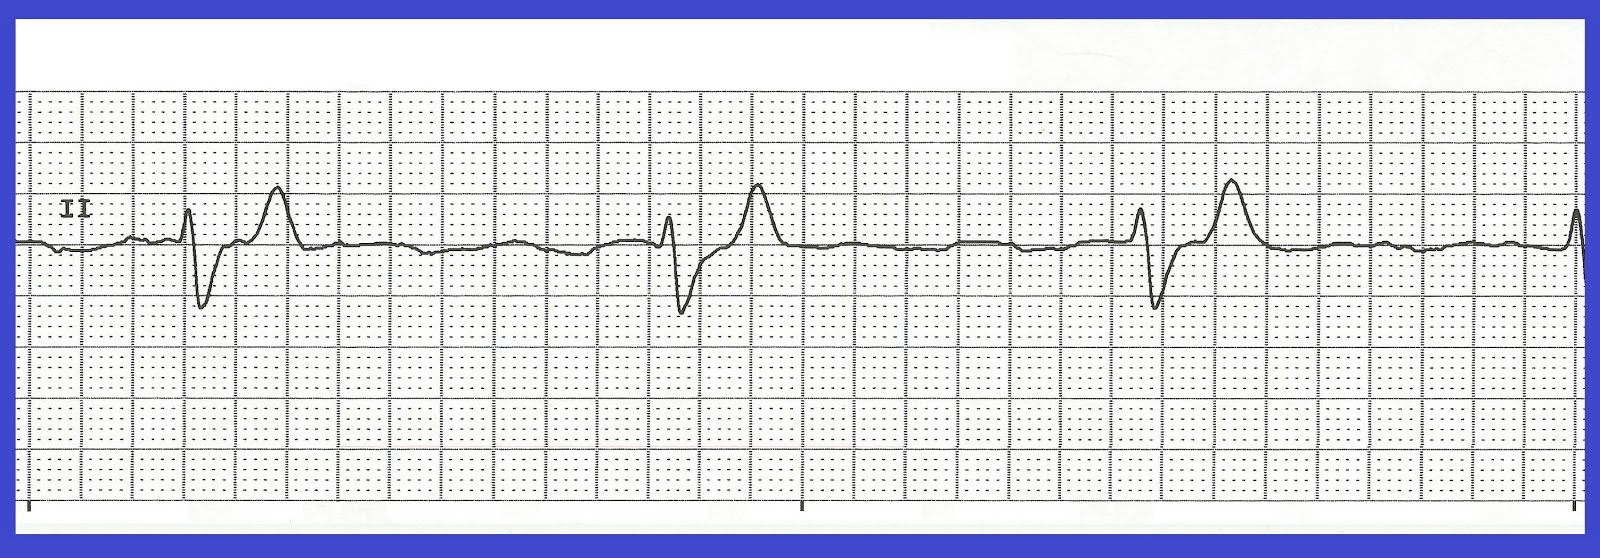 Float Nurse: Basic EKG Rhythm Test 10